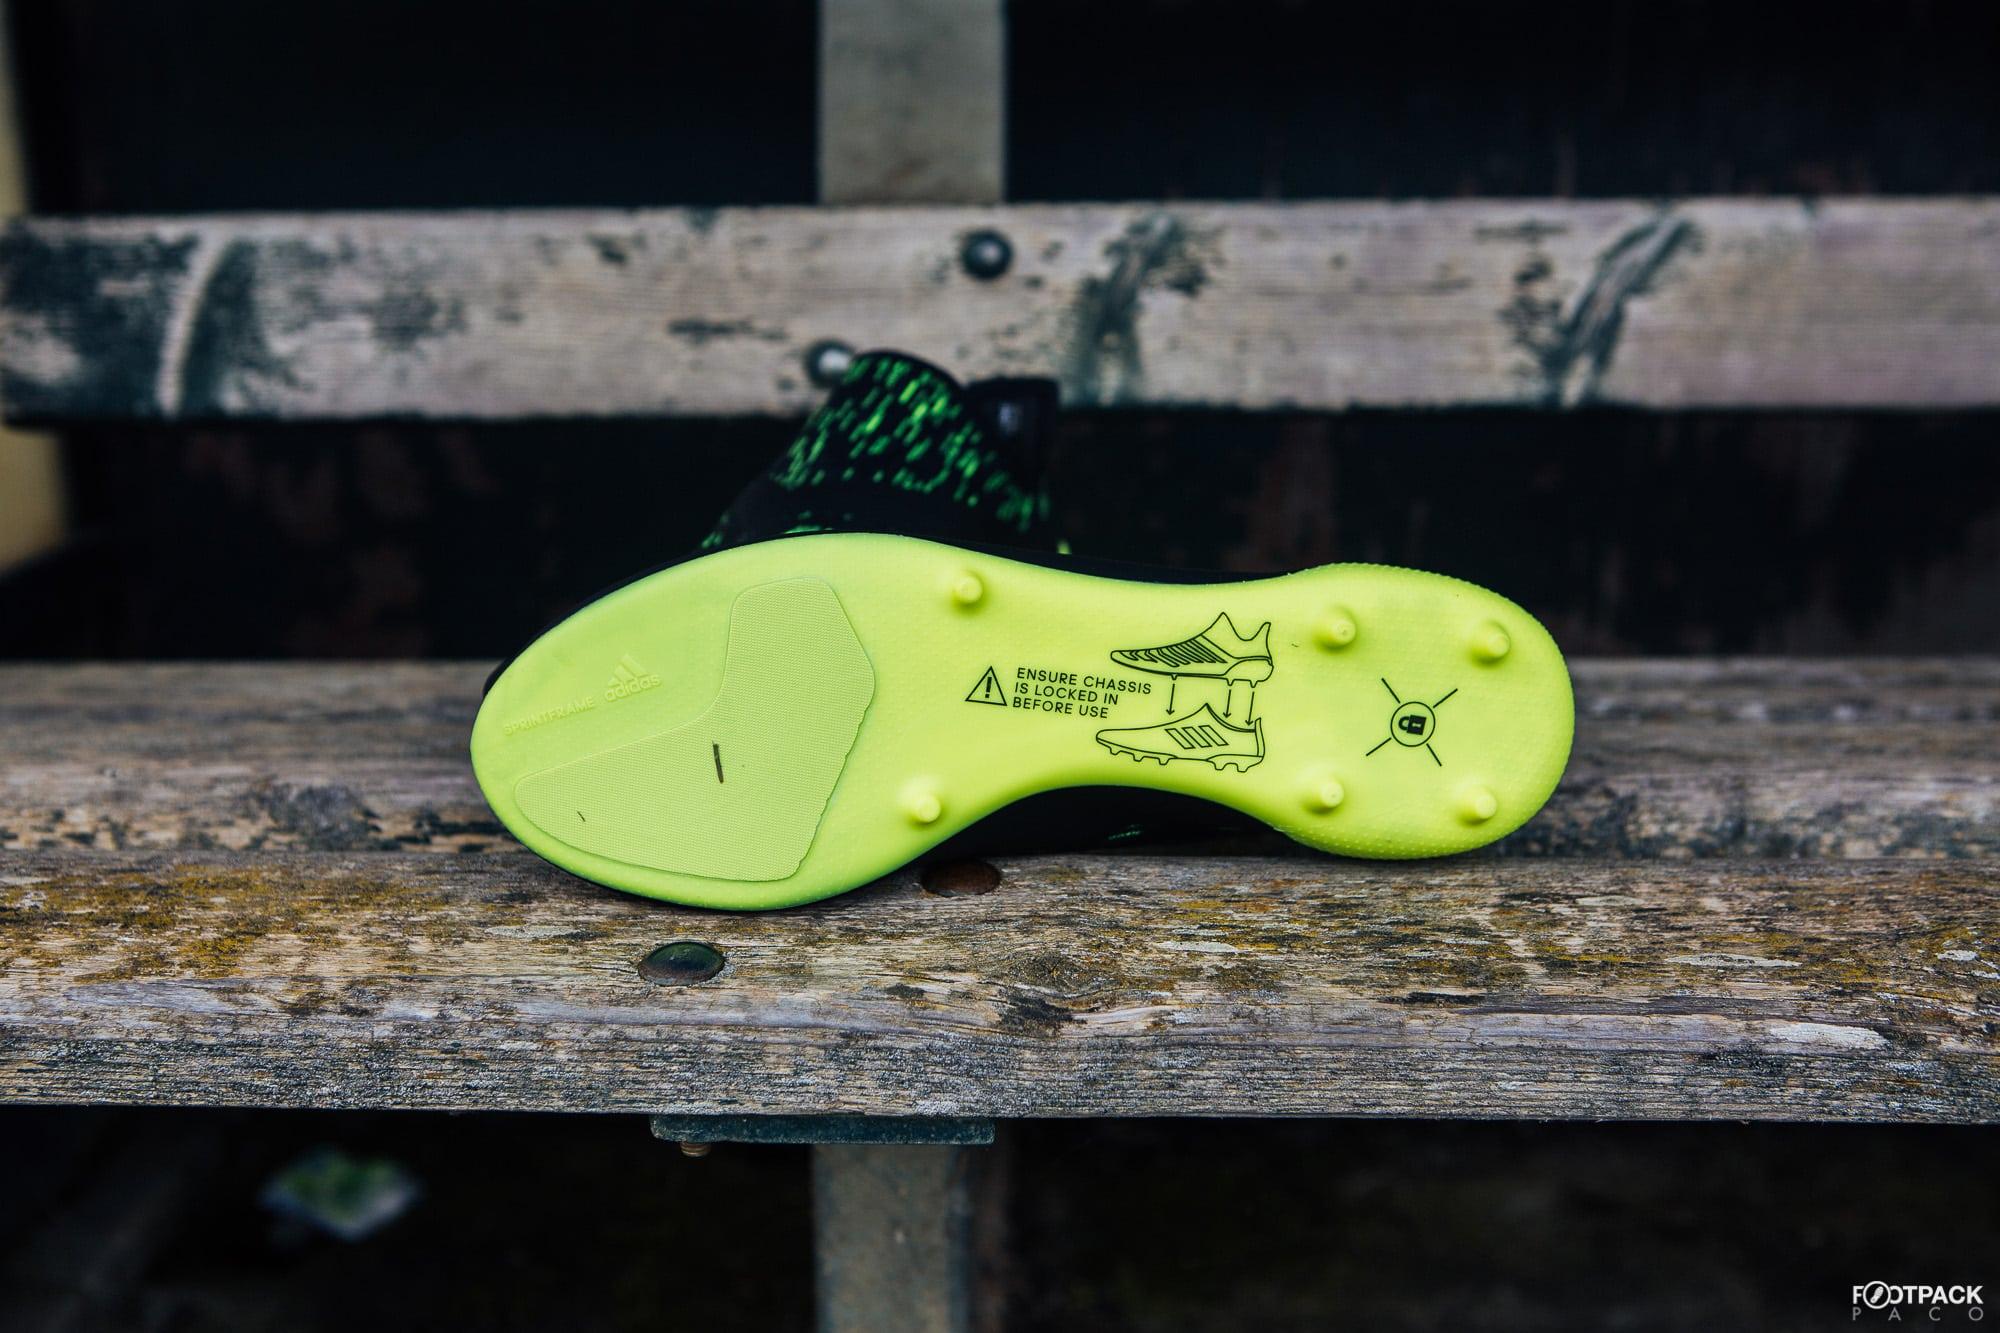 Chaussure-adidas-football-glitch-inershoe-chausson-2-0-juin-2018-2